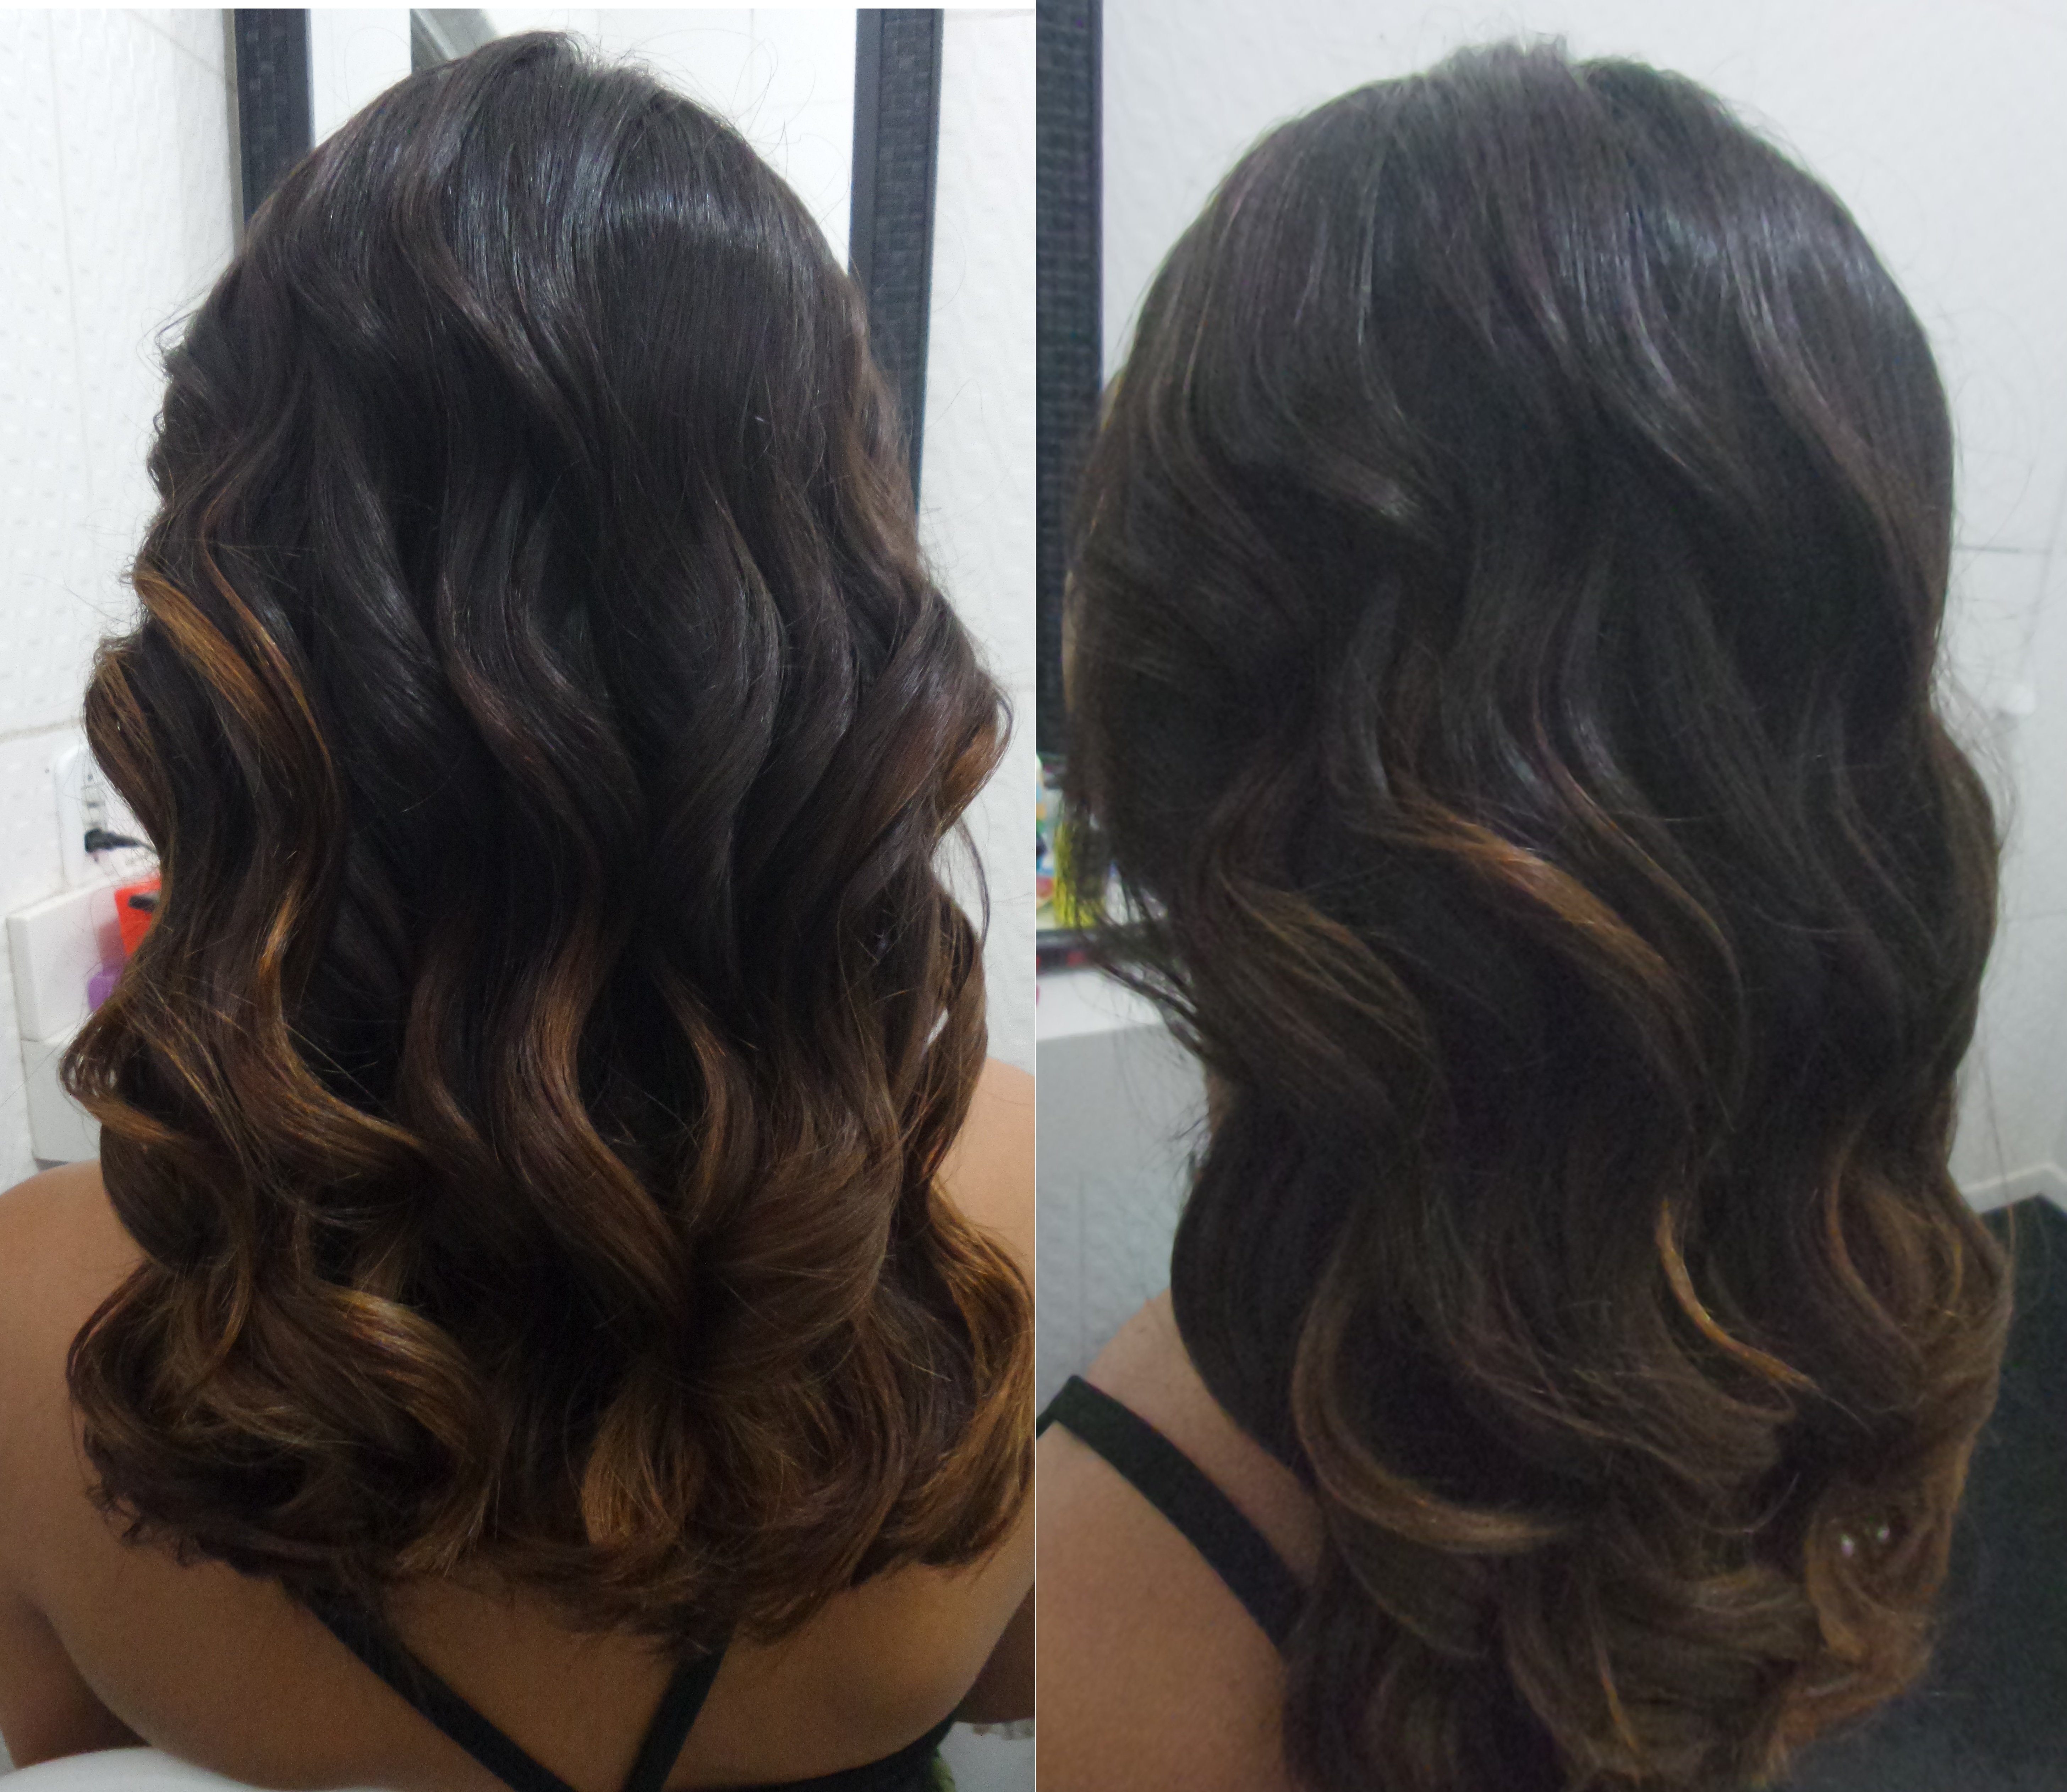 ombre hair no tom de 7.23 golden brown , lindíssimo   #morena iluminada  cabelo cabeleireiro(a)